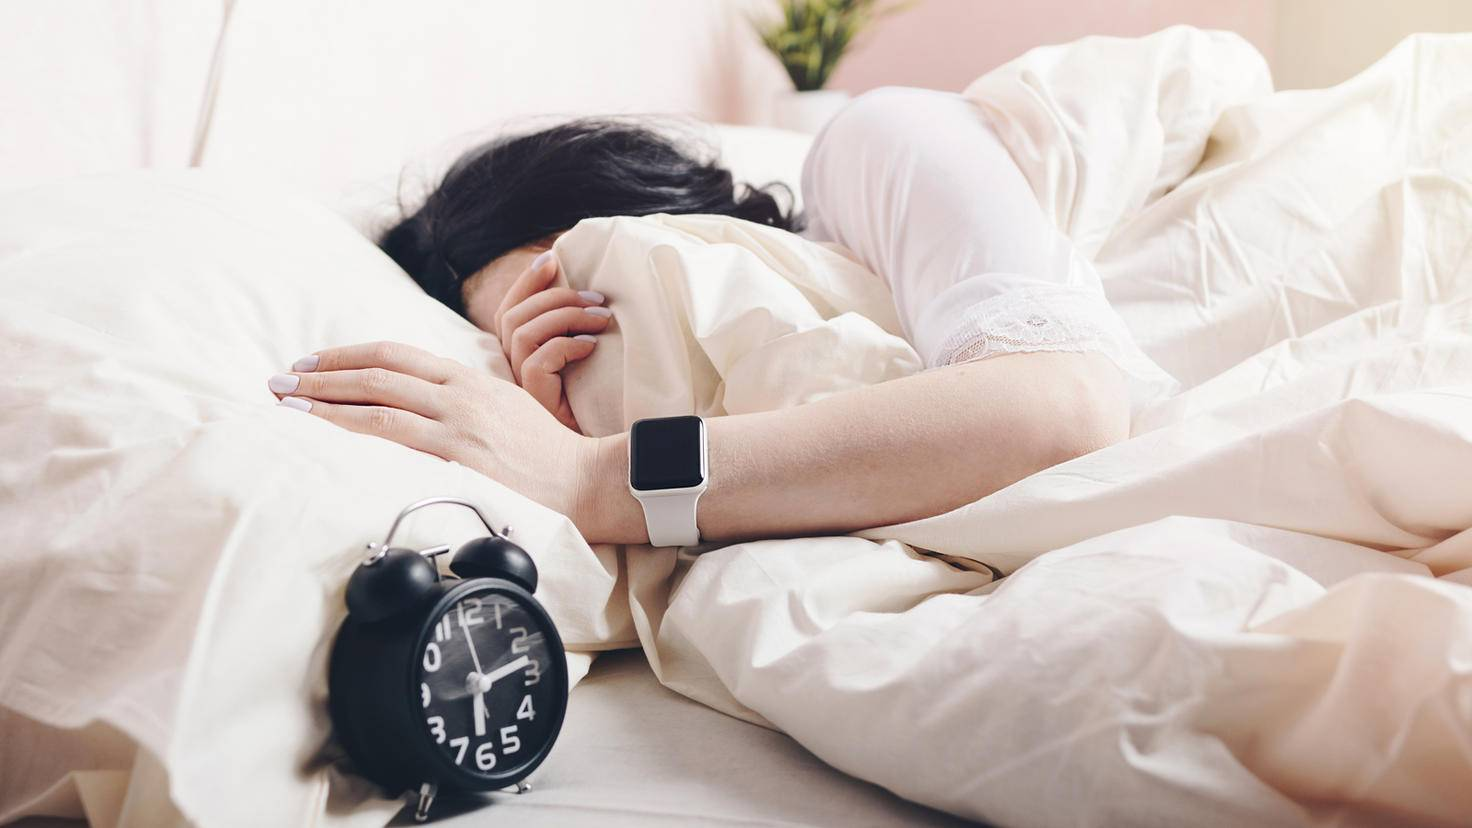 femeie in pat cu apple watch